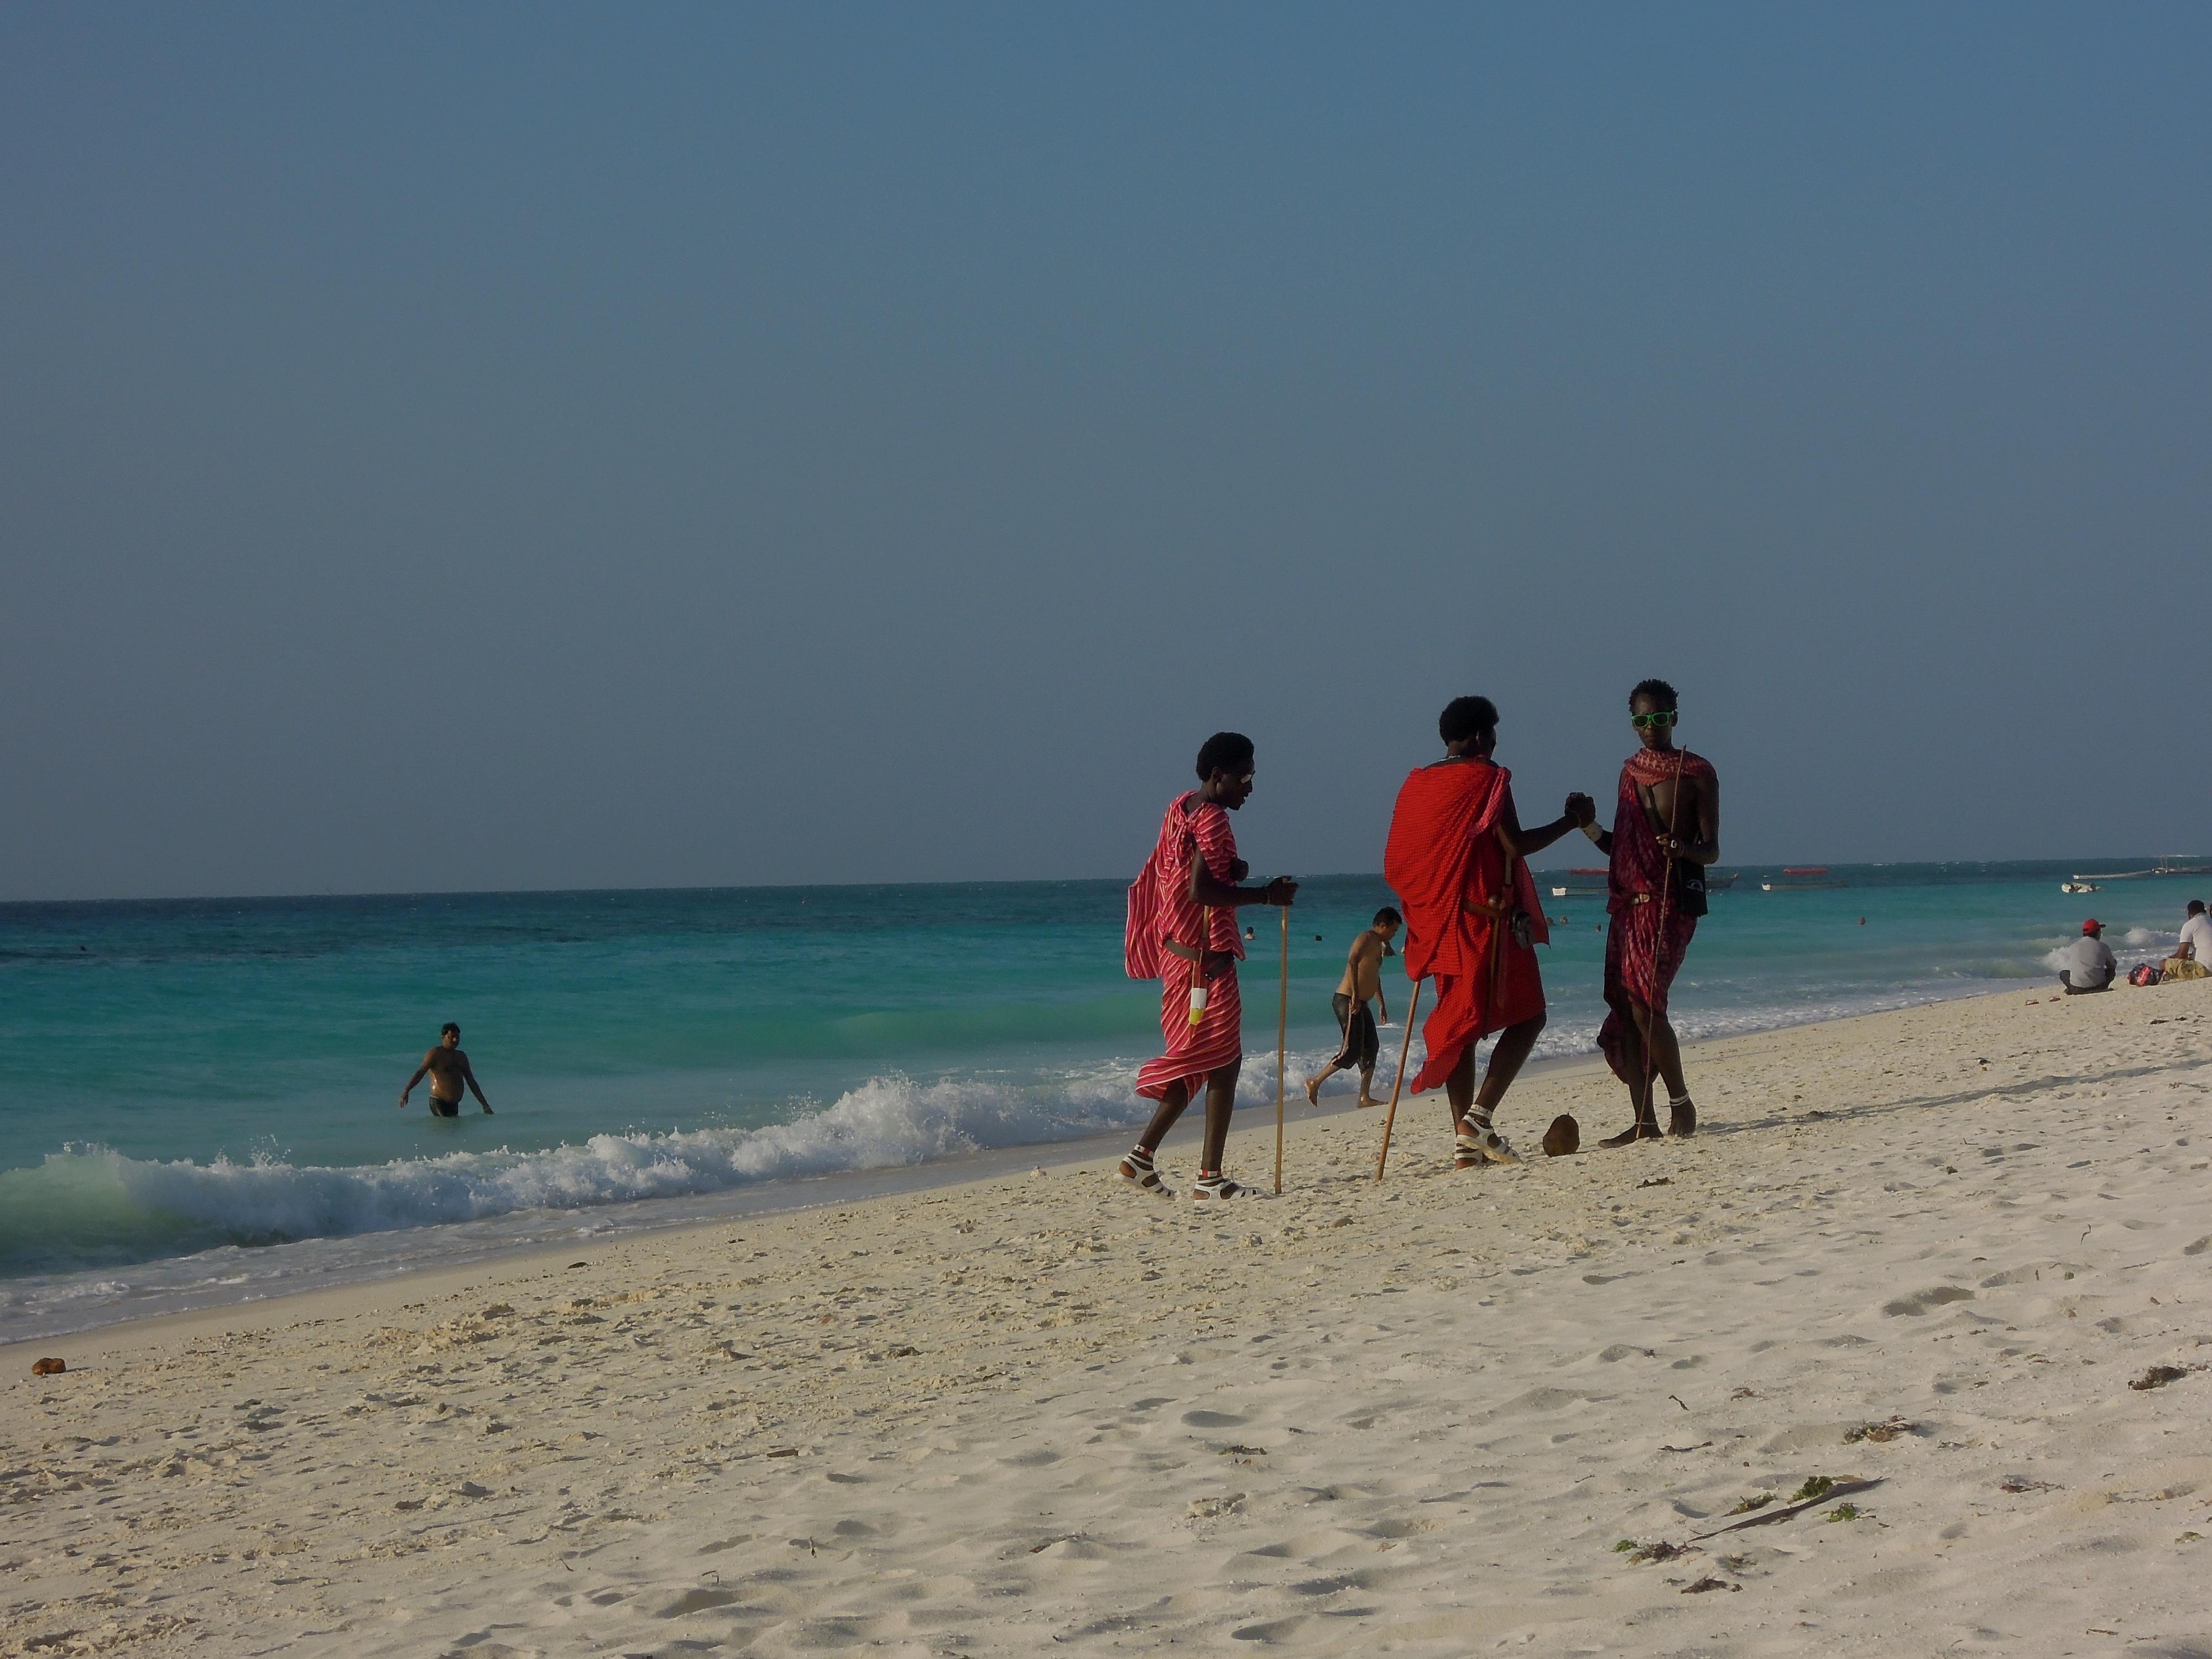 Nungwi, Zanzibar,Tanzania, fot. M. Lehrmann